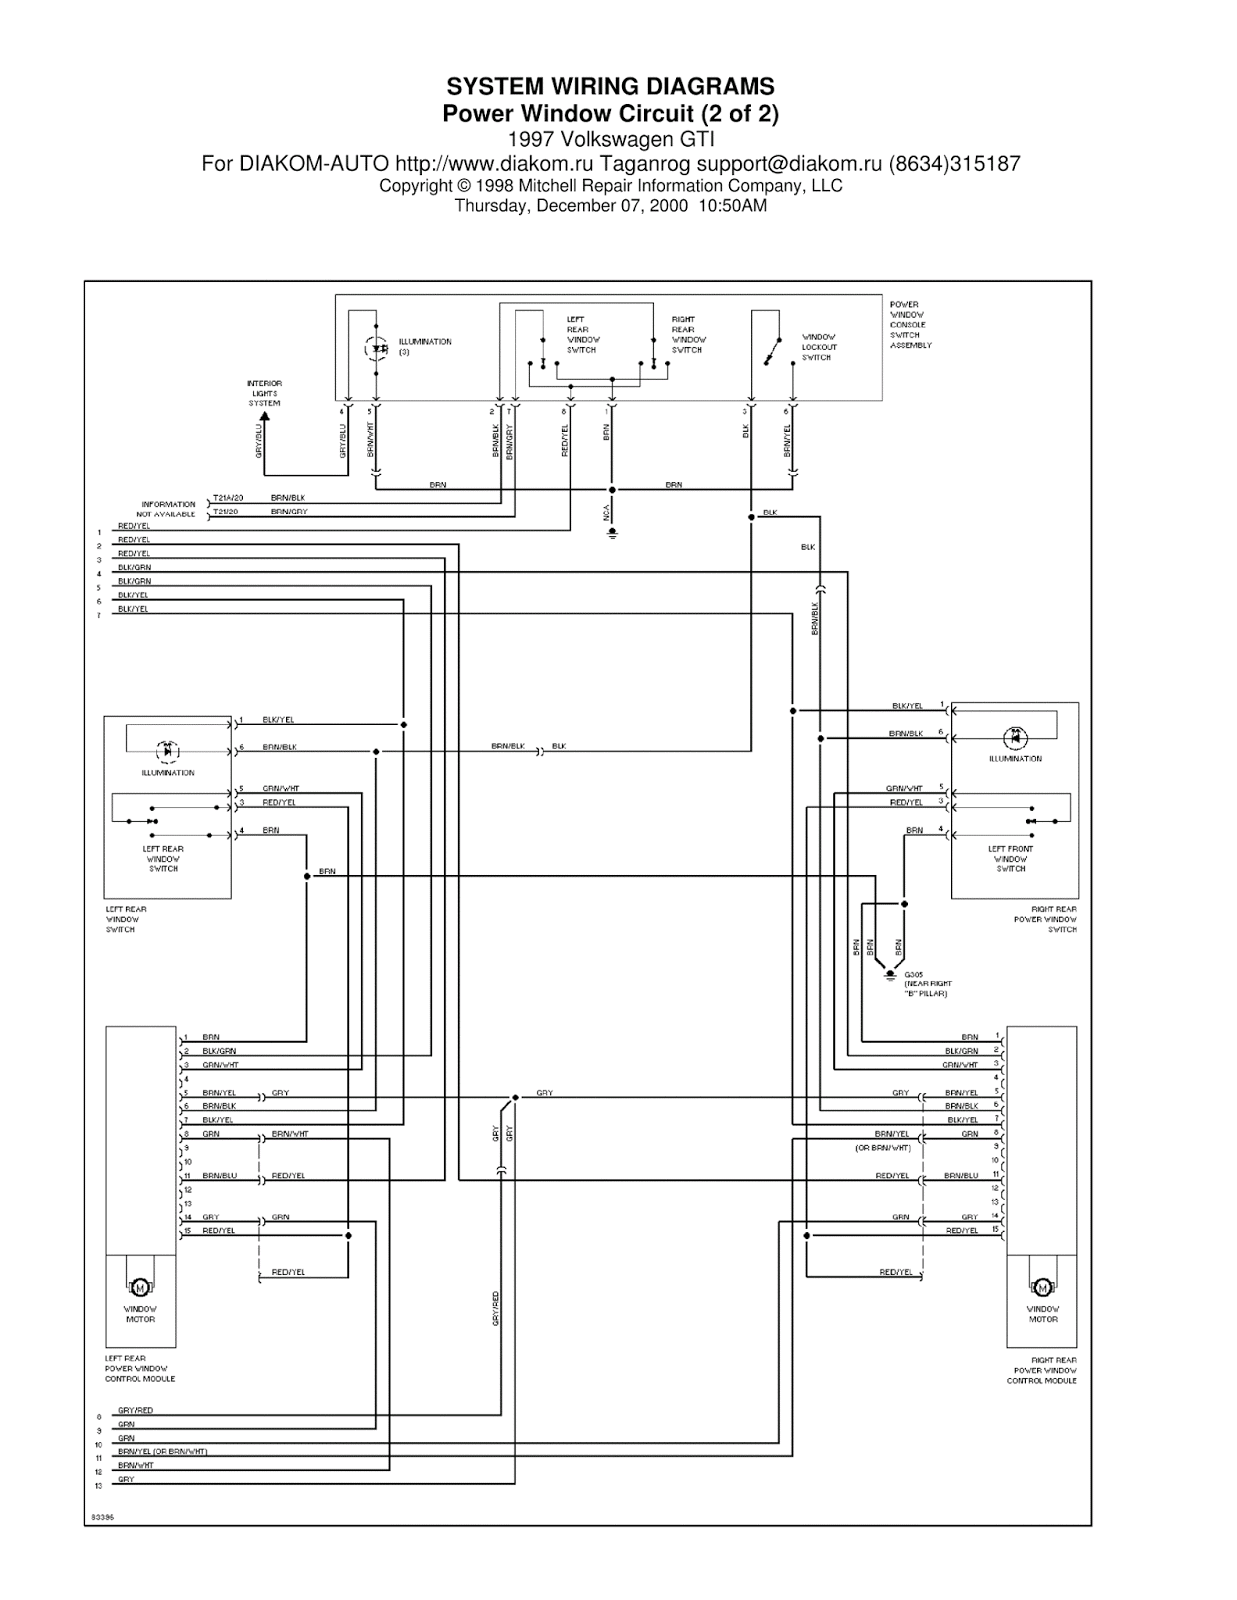 1969 Camaro Door Glass Diagram On 71 Camaro Tail Light Wiring Diagram